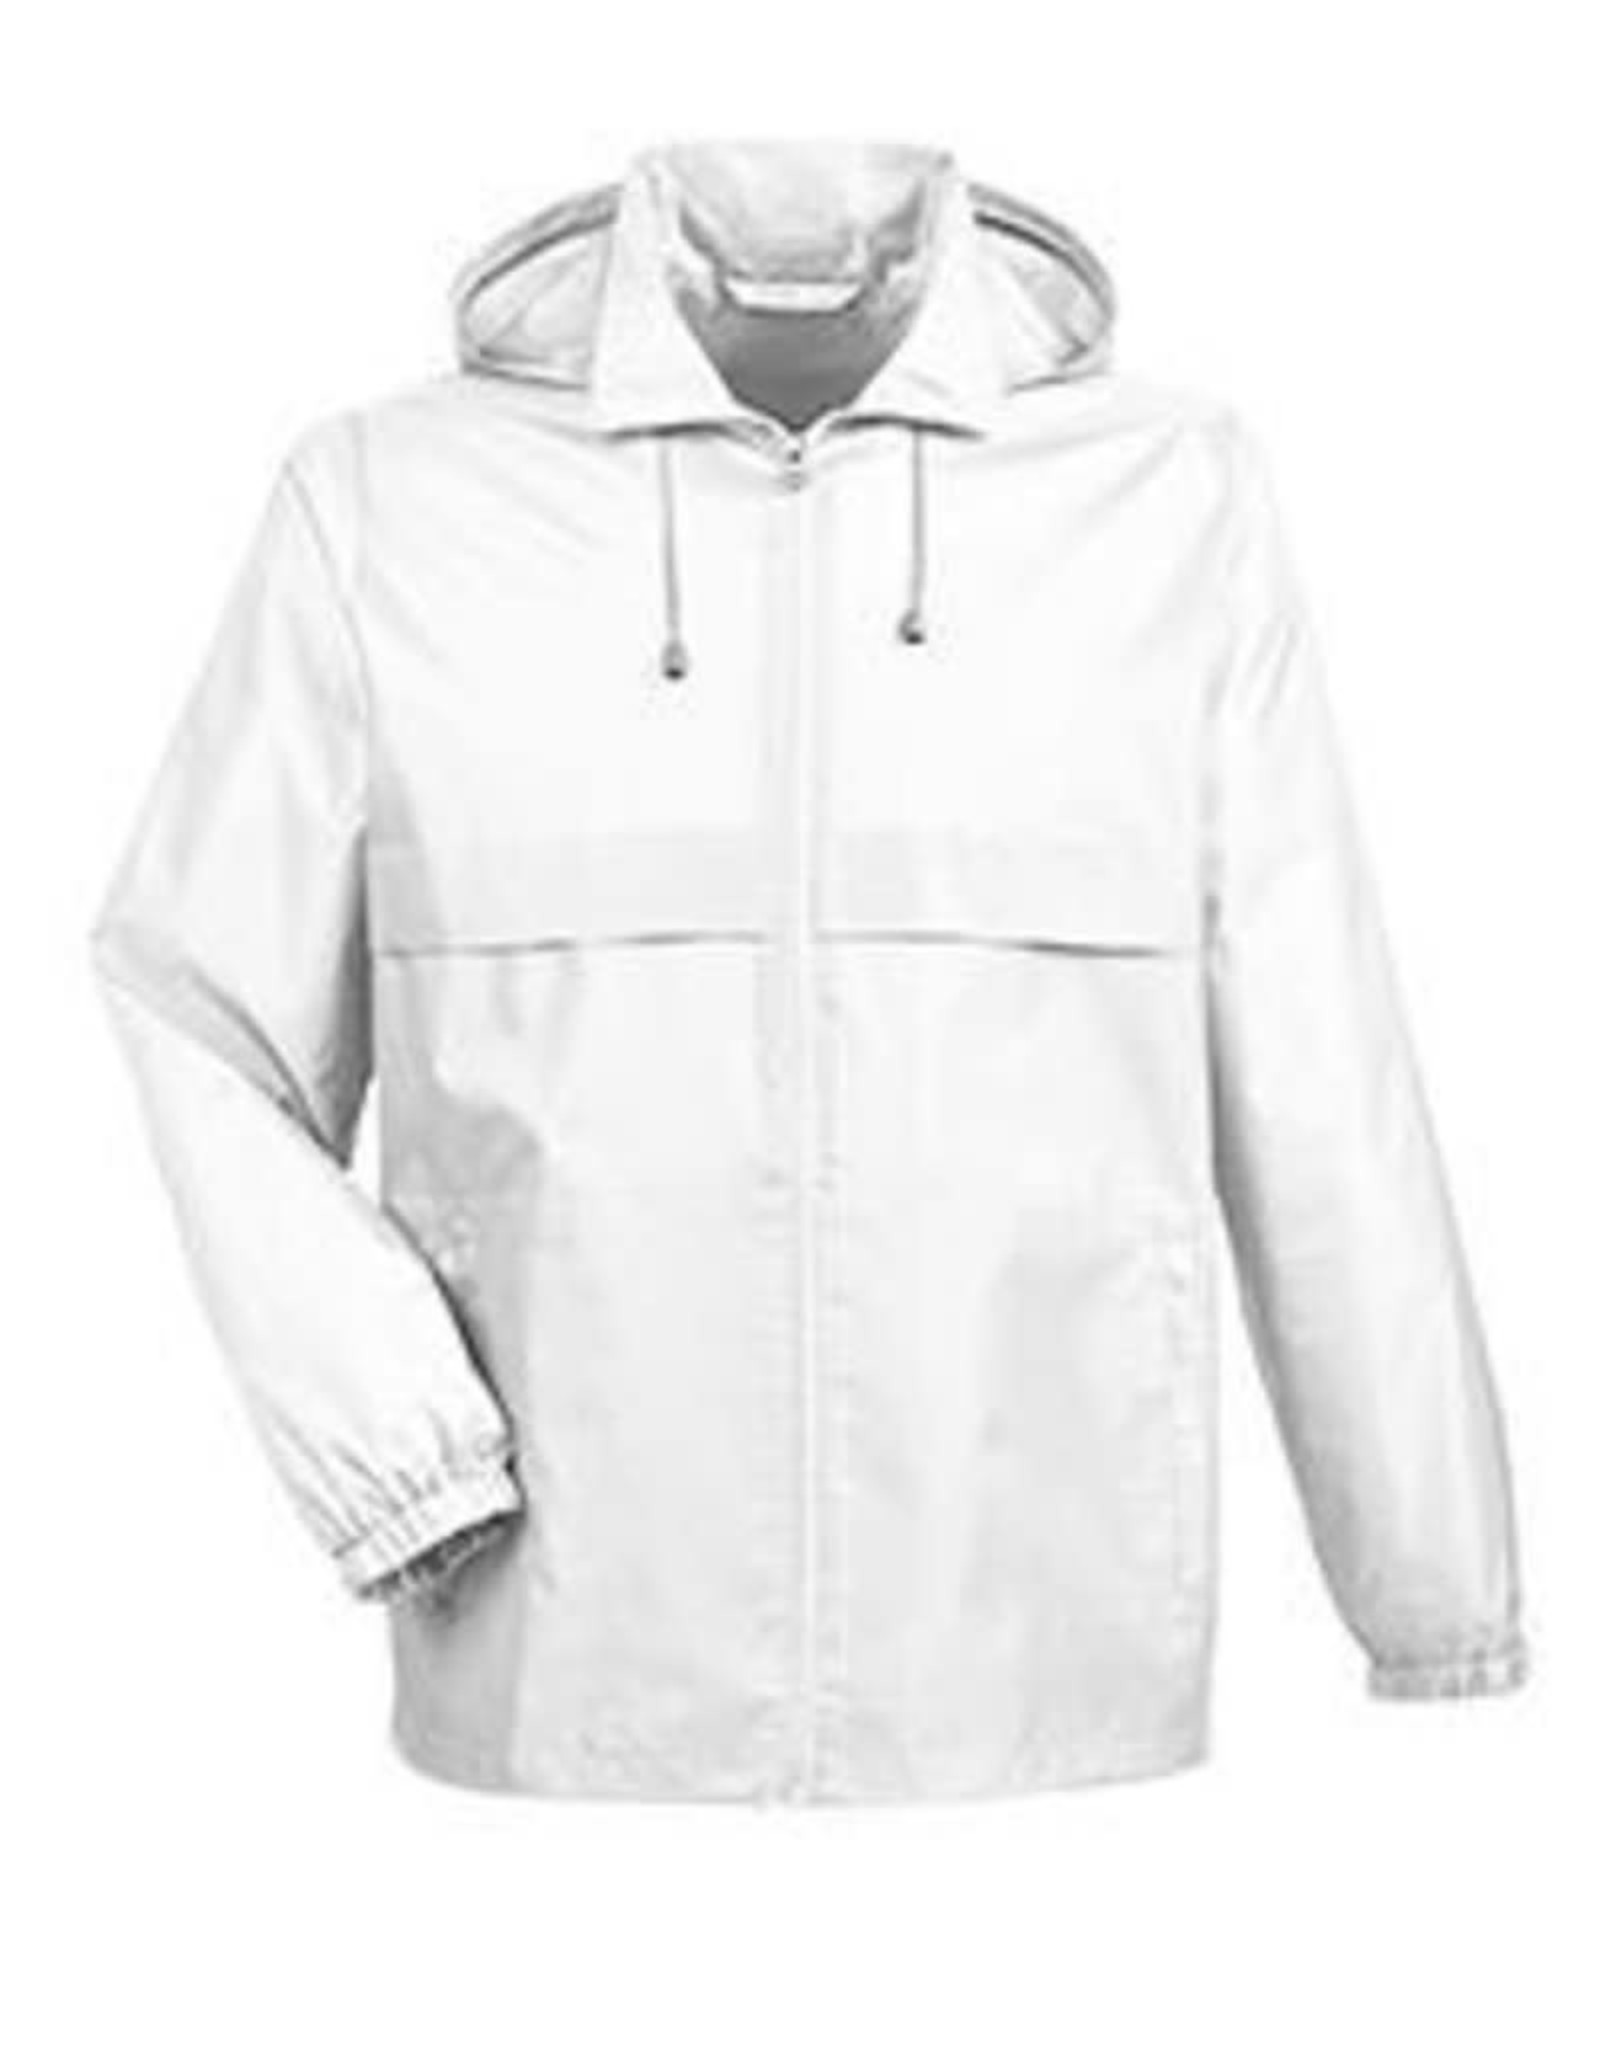 NON-UNIFORM JACKET - Custom Lightweight Jacket with Detachable Hood grey white or navy